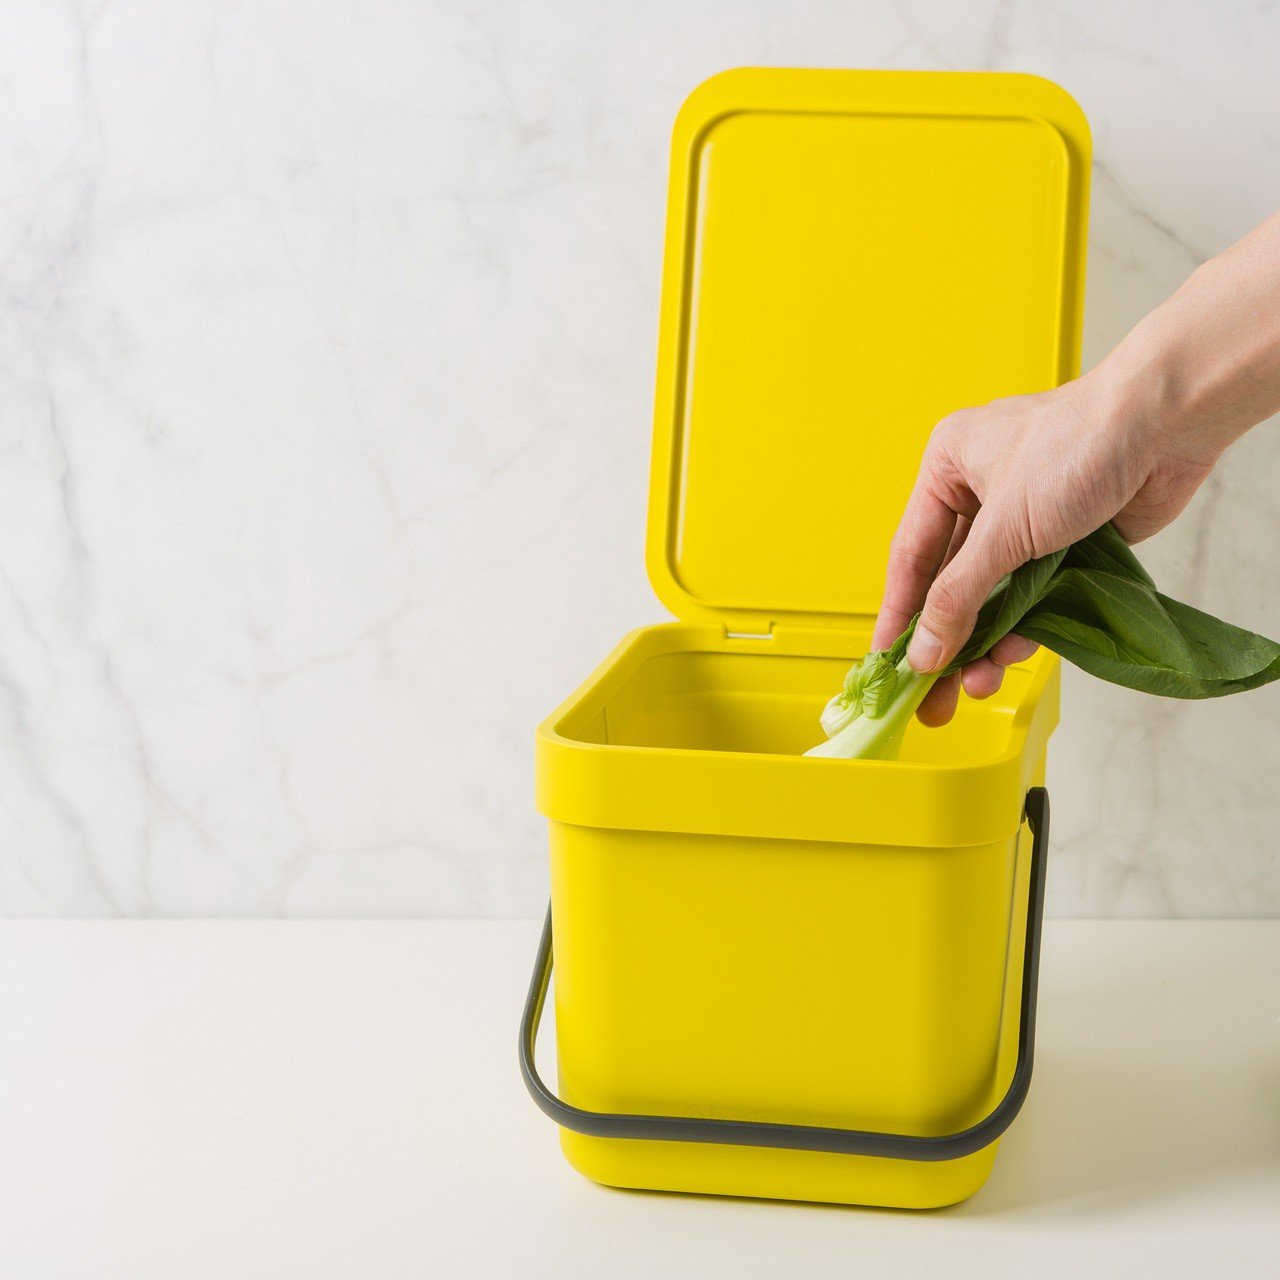 Brabanti多功能餐廚置物桶6L黃色:市價1200元,扣800福利點+450...